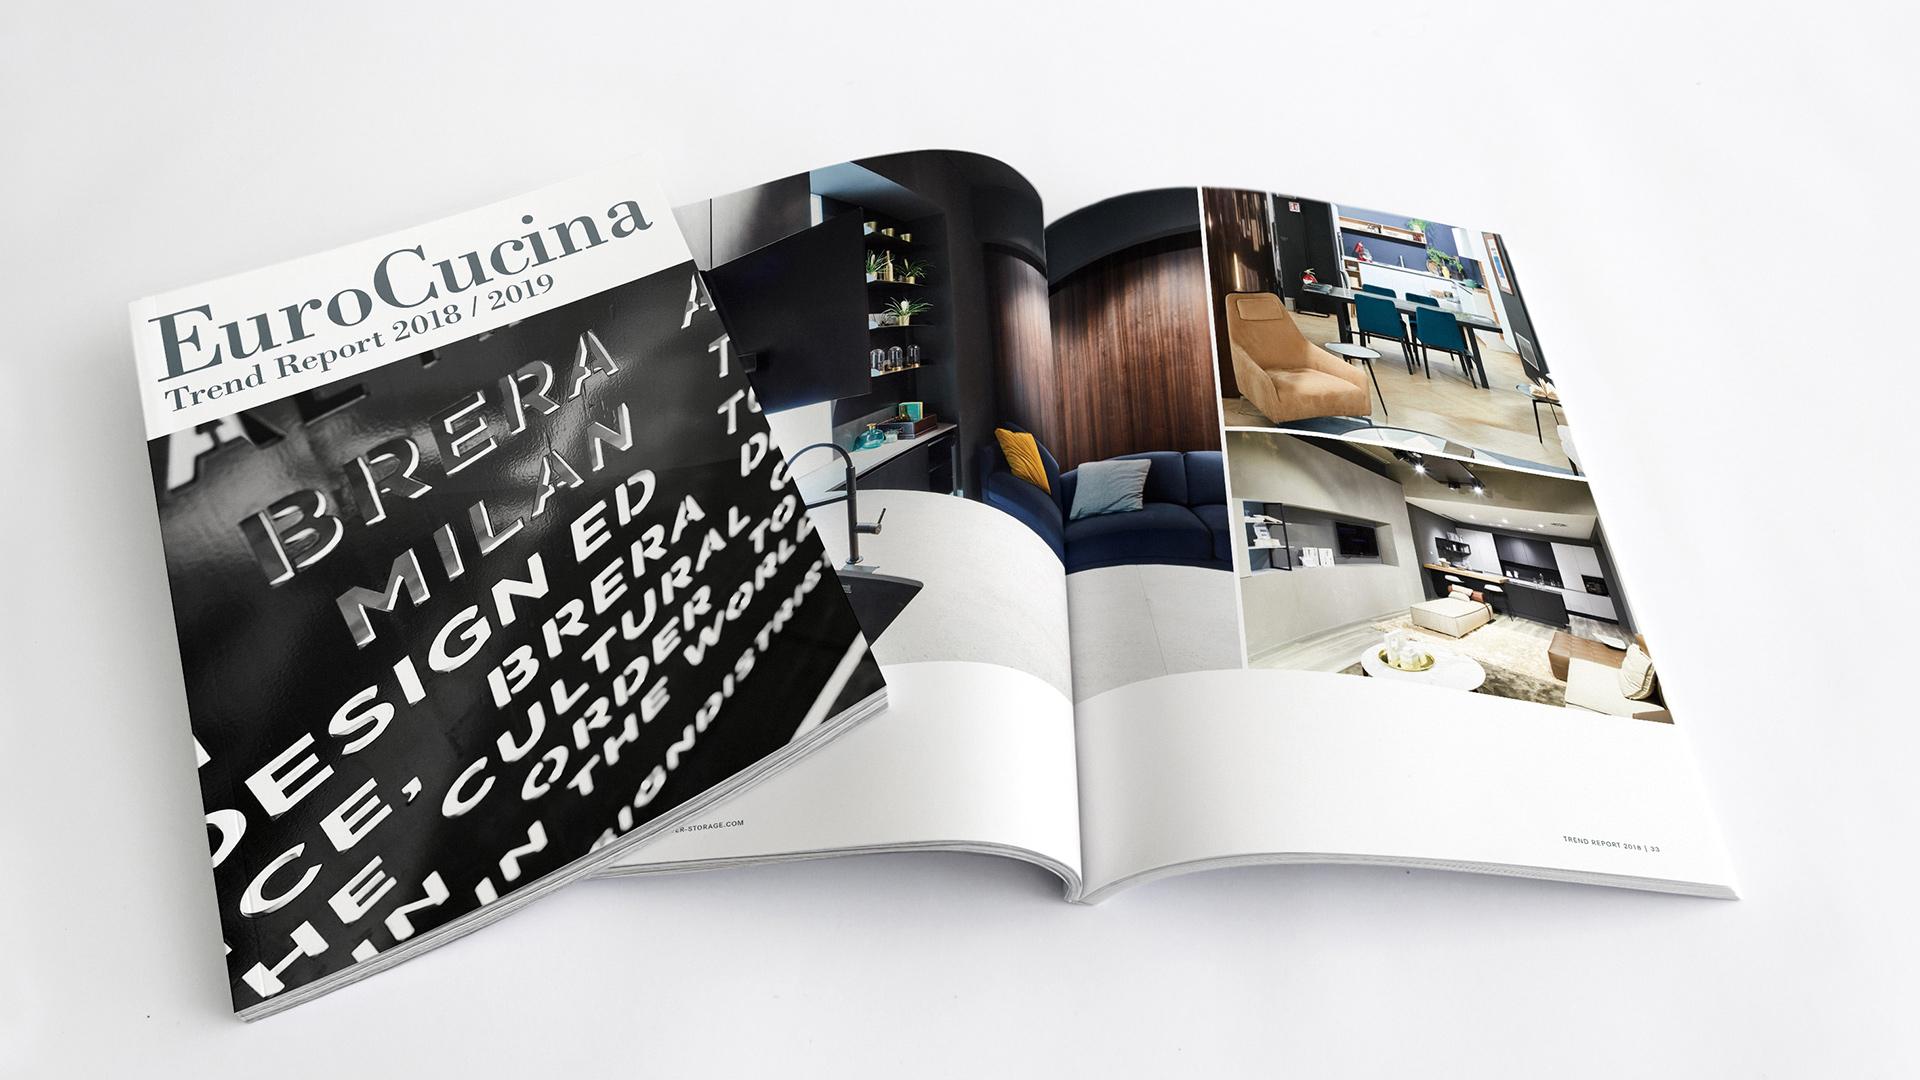 Trendreport EuroCucina 2018/2019: Kesseböhmer documents the future of the kitchen